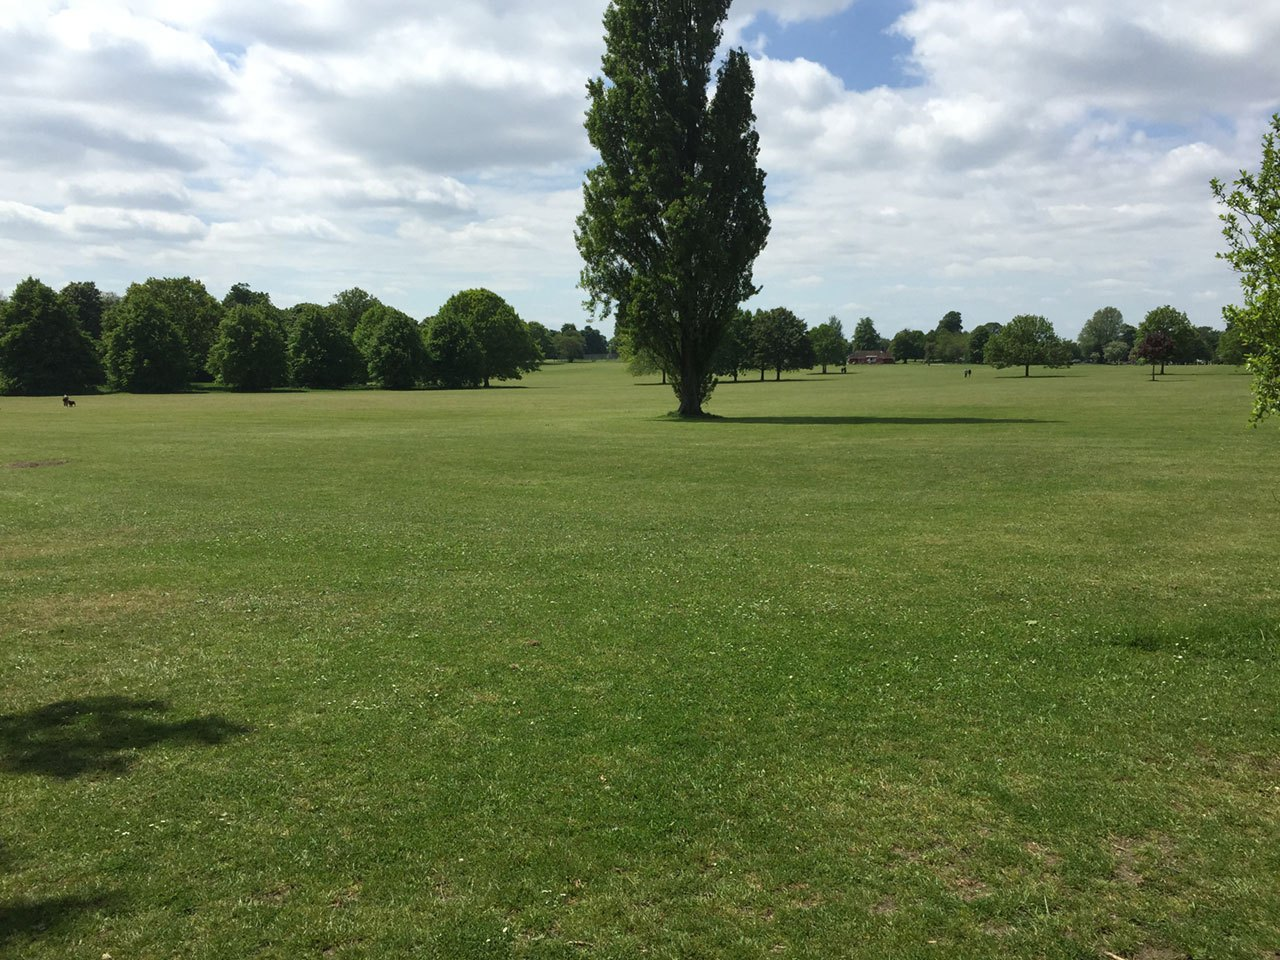 Eltham Park South, London